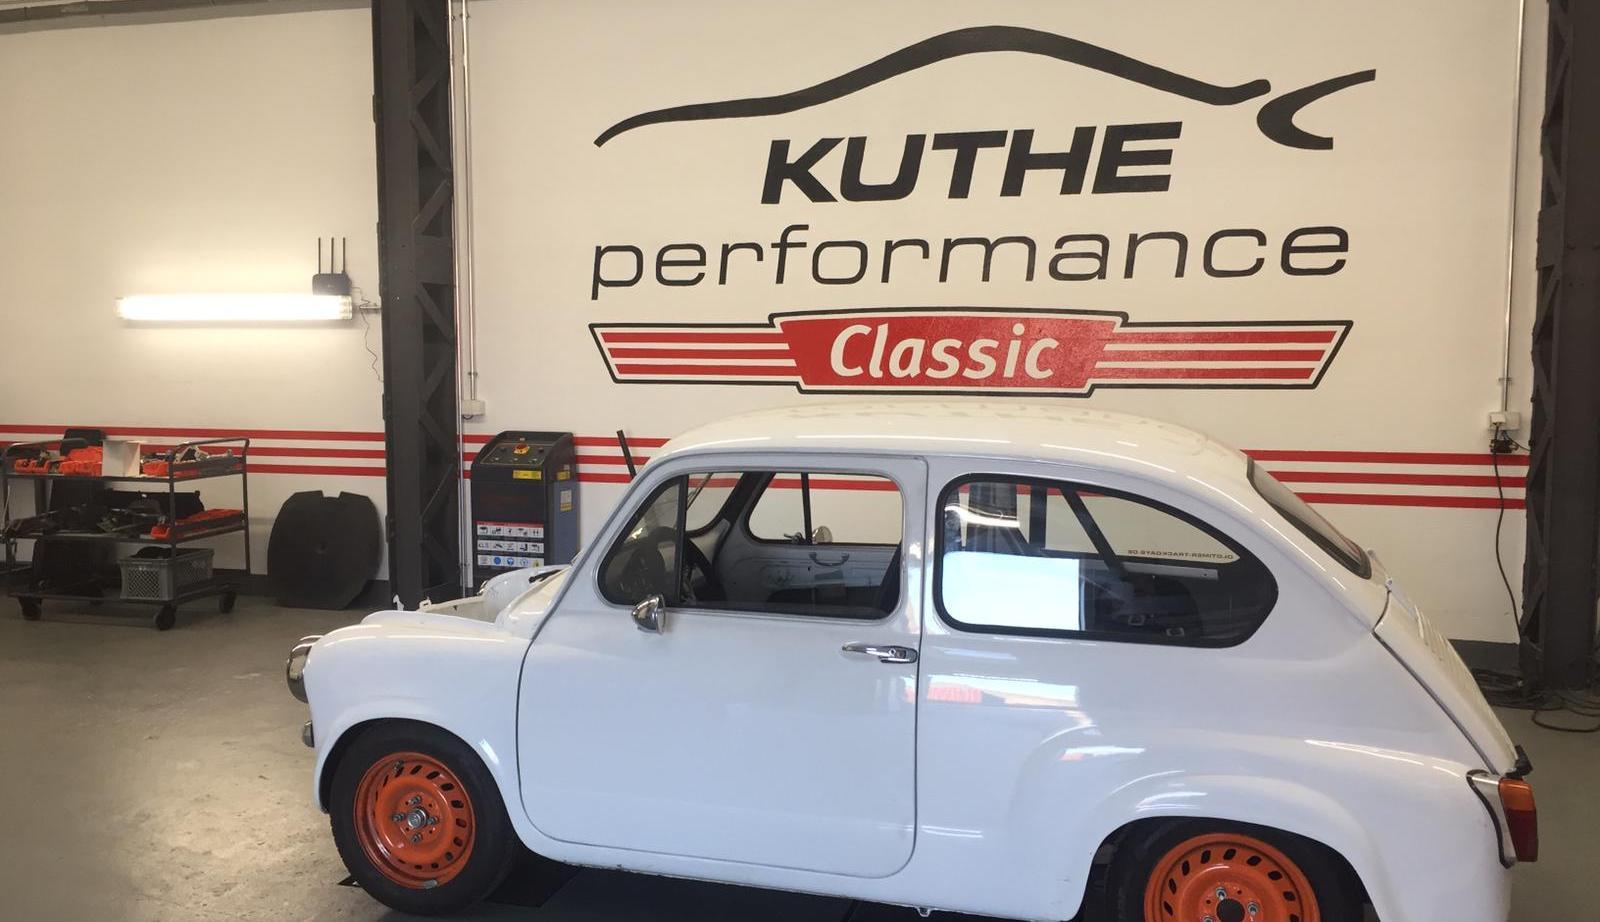 Kuthe Performance Classic